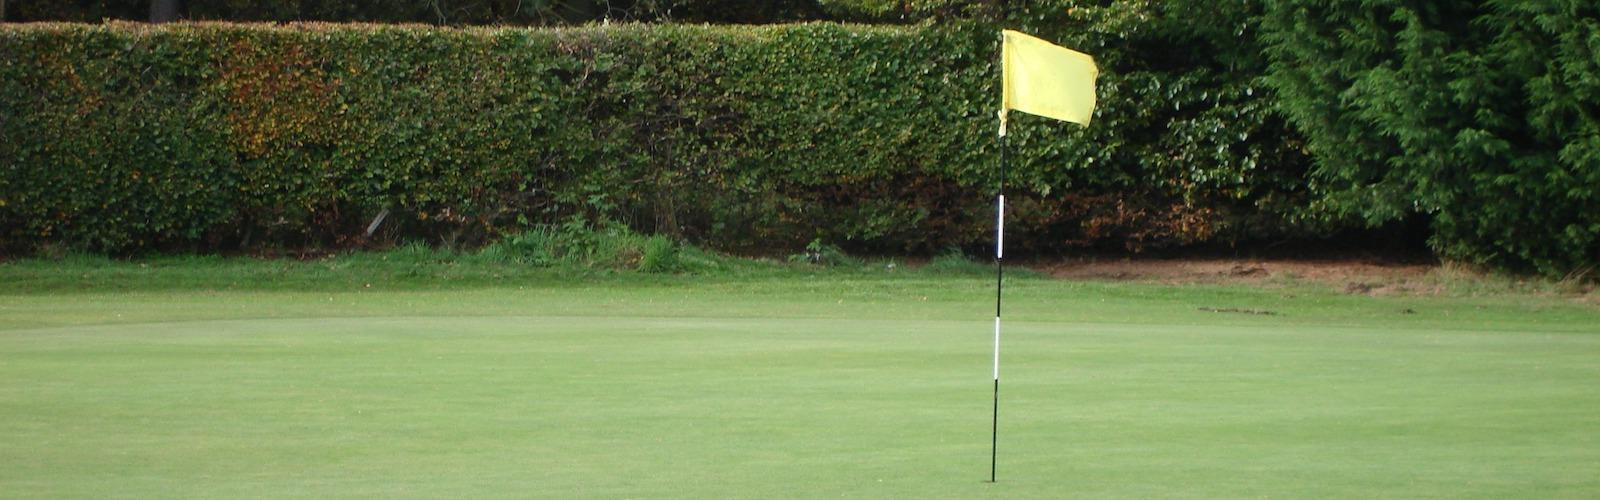 See all 9 photos taken at crowder's mountain golf club by 108 visitors. Crowders Mountain Golf Club Golf North Carolina